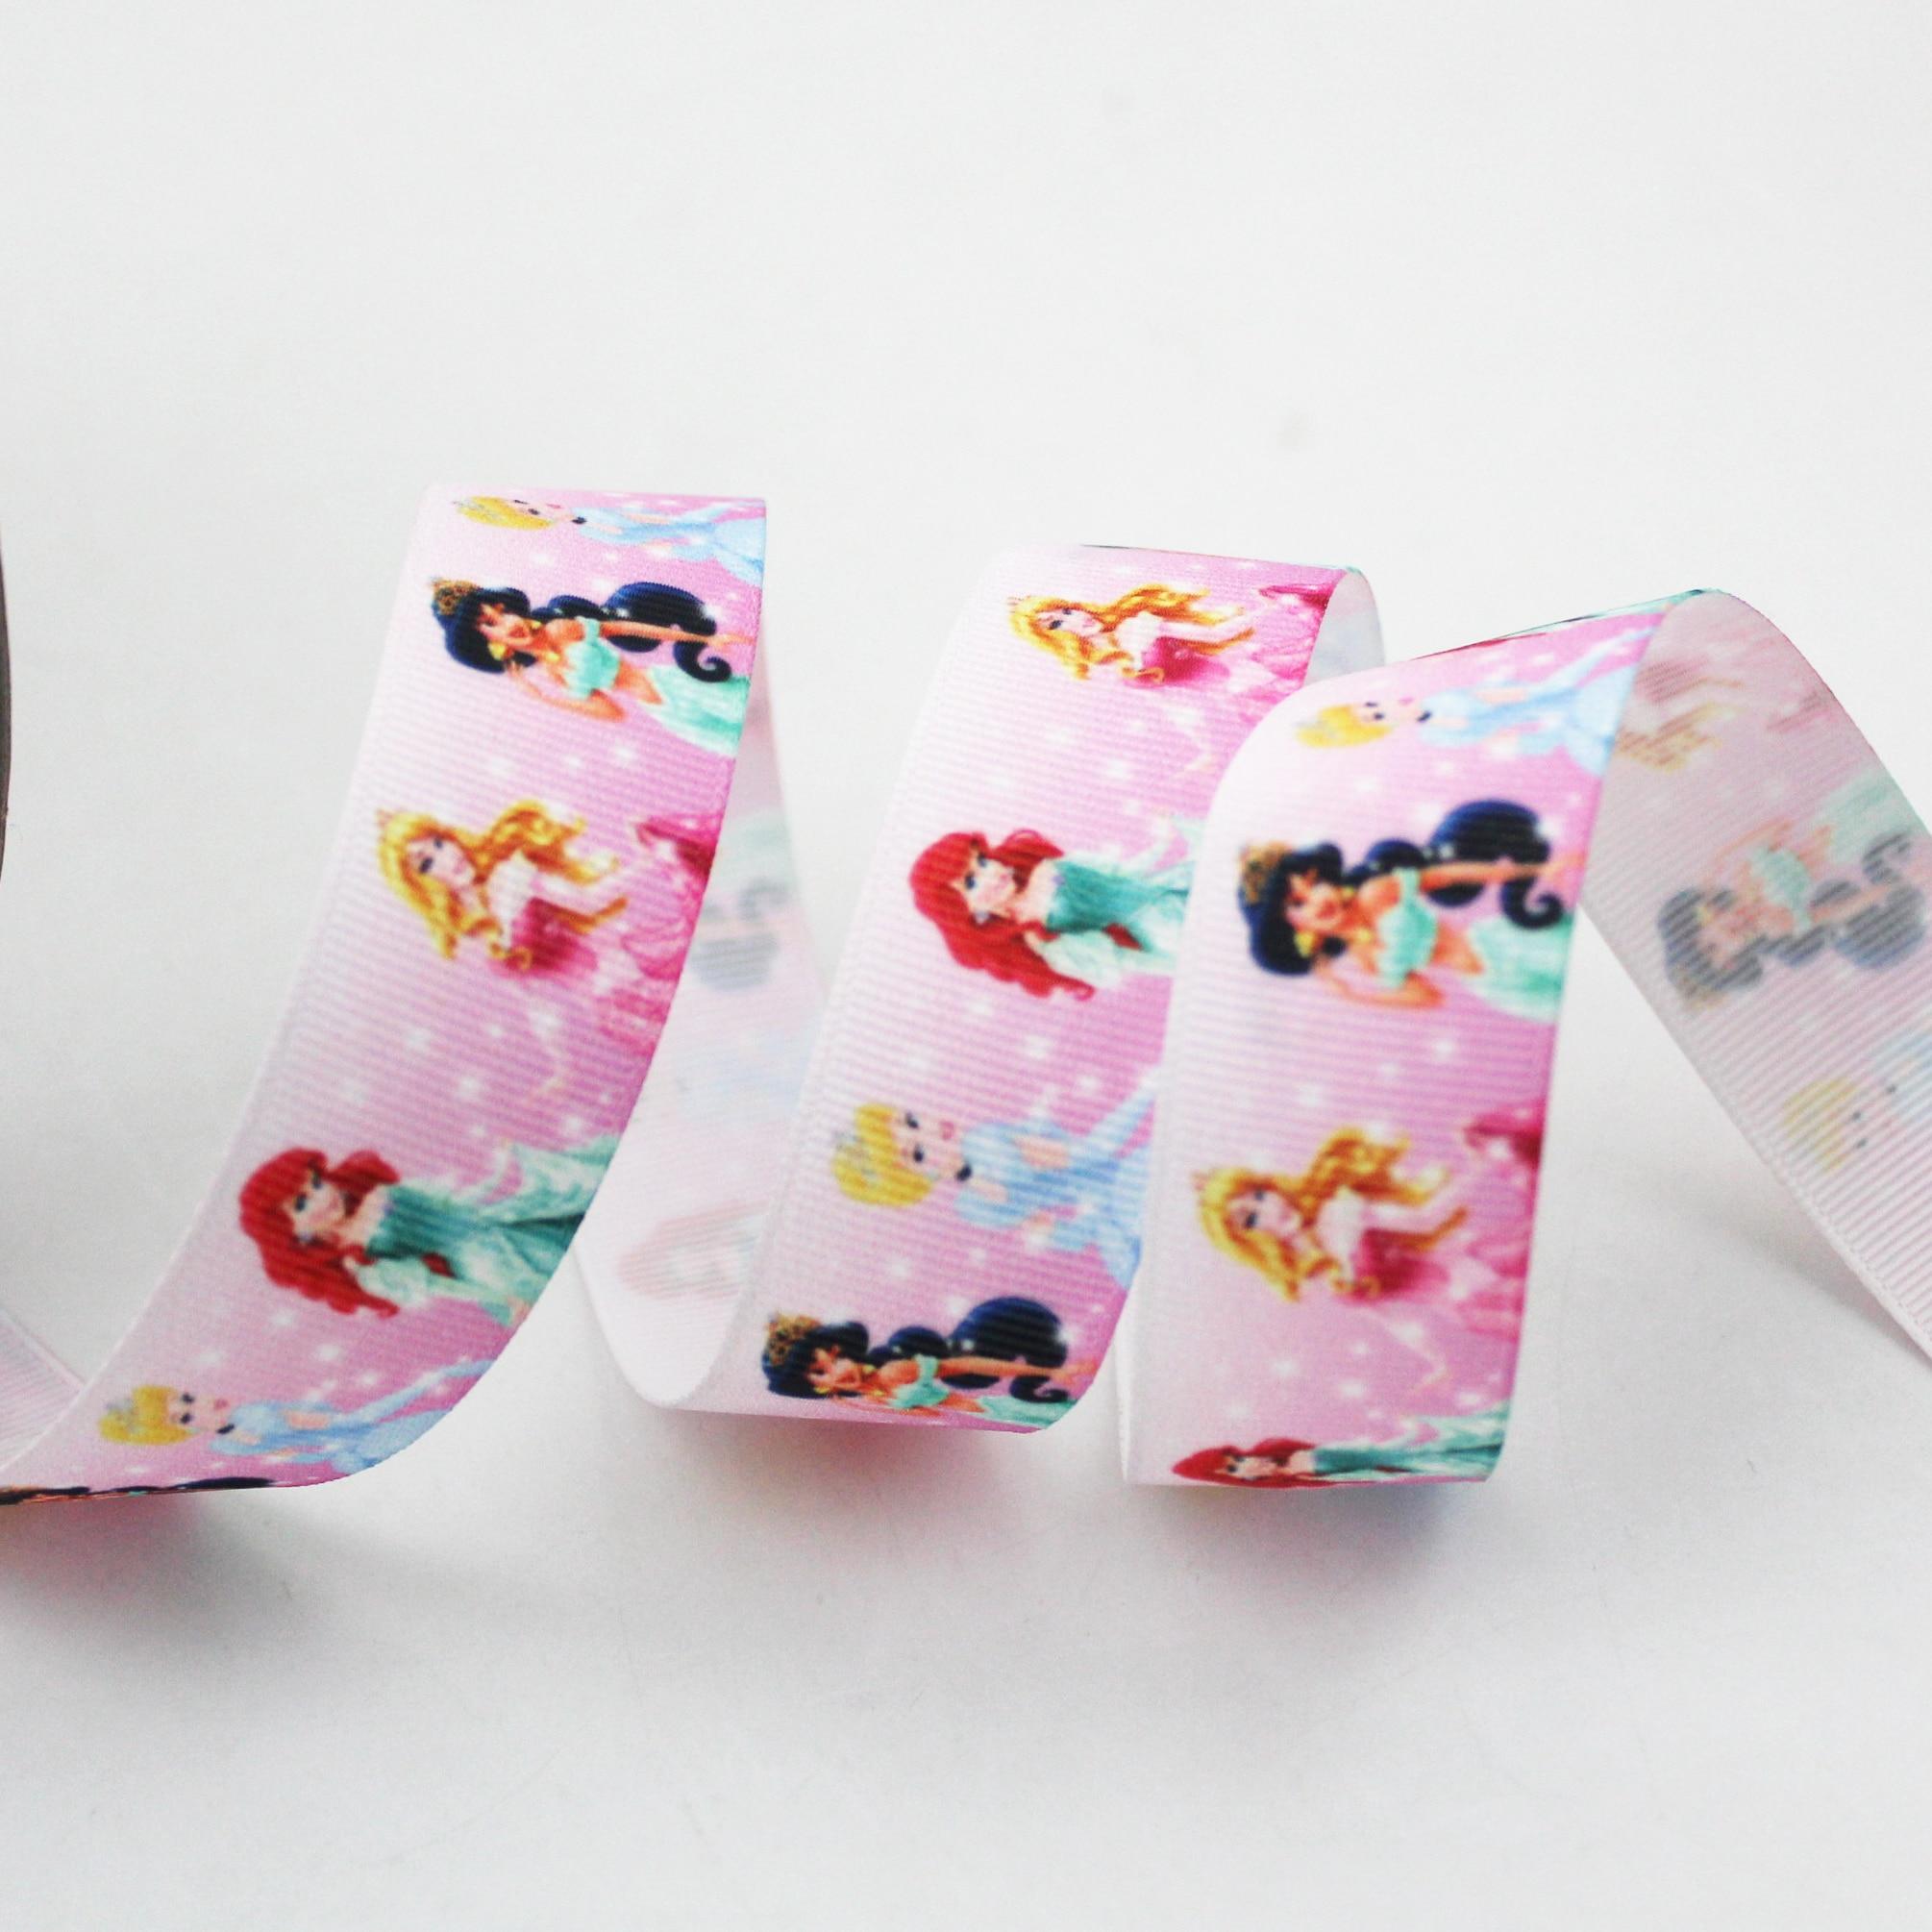 Cinta de grogrén Rosa impresa 38mm 10 yardas limón estampado de manzanas boda fiesta decoración cintas DIY cinta Paquete de regalo